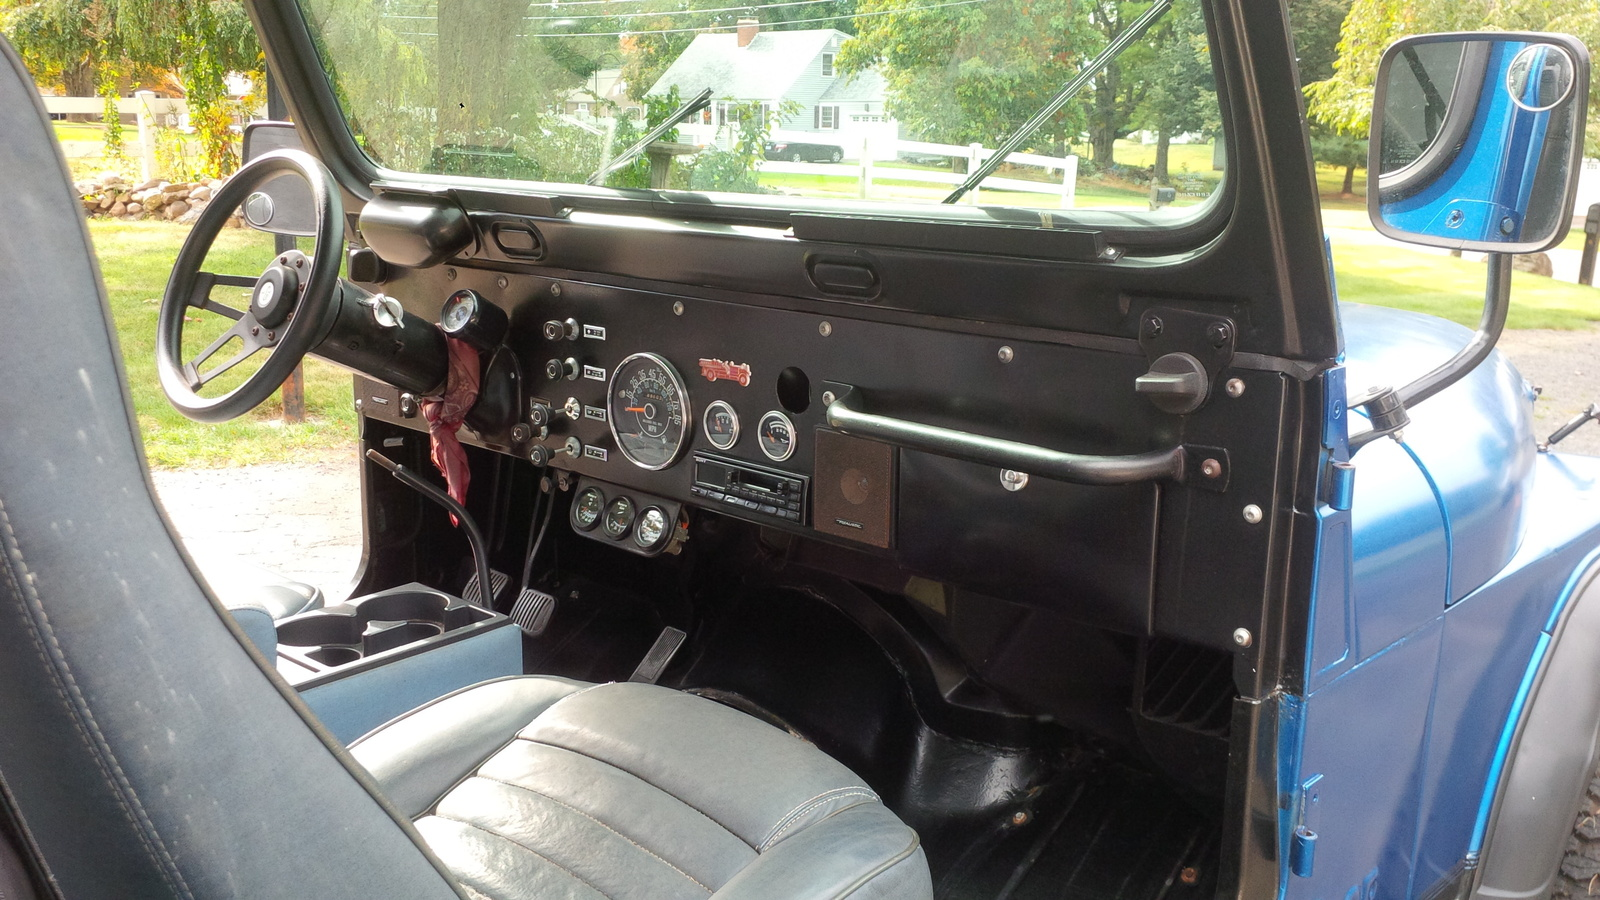 1976 jeep cj5 wiring diagram 1976 jeep wiring diagram 1976 jeep grand cherokee  1976 jeep cj7